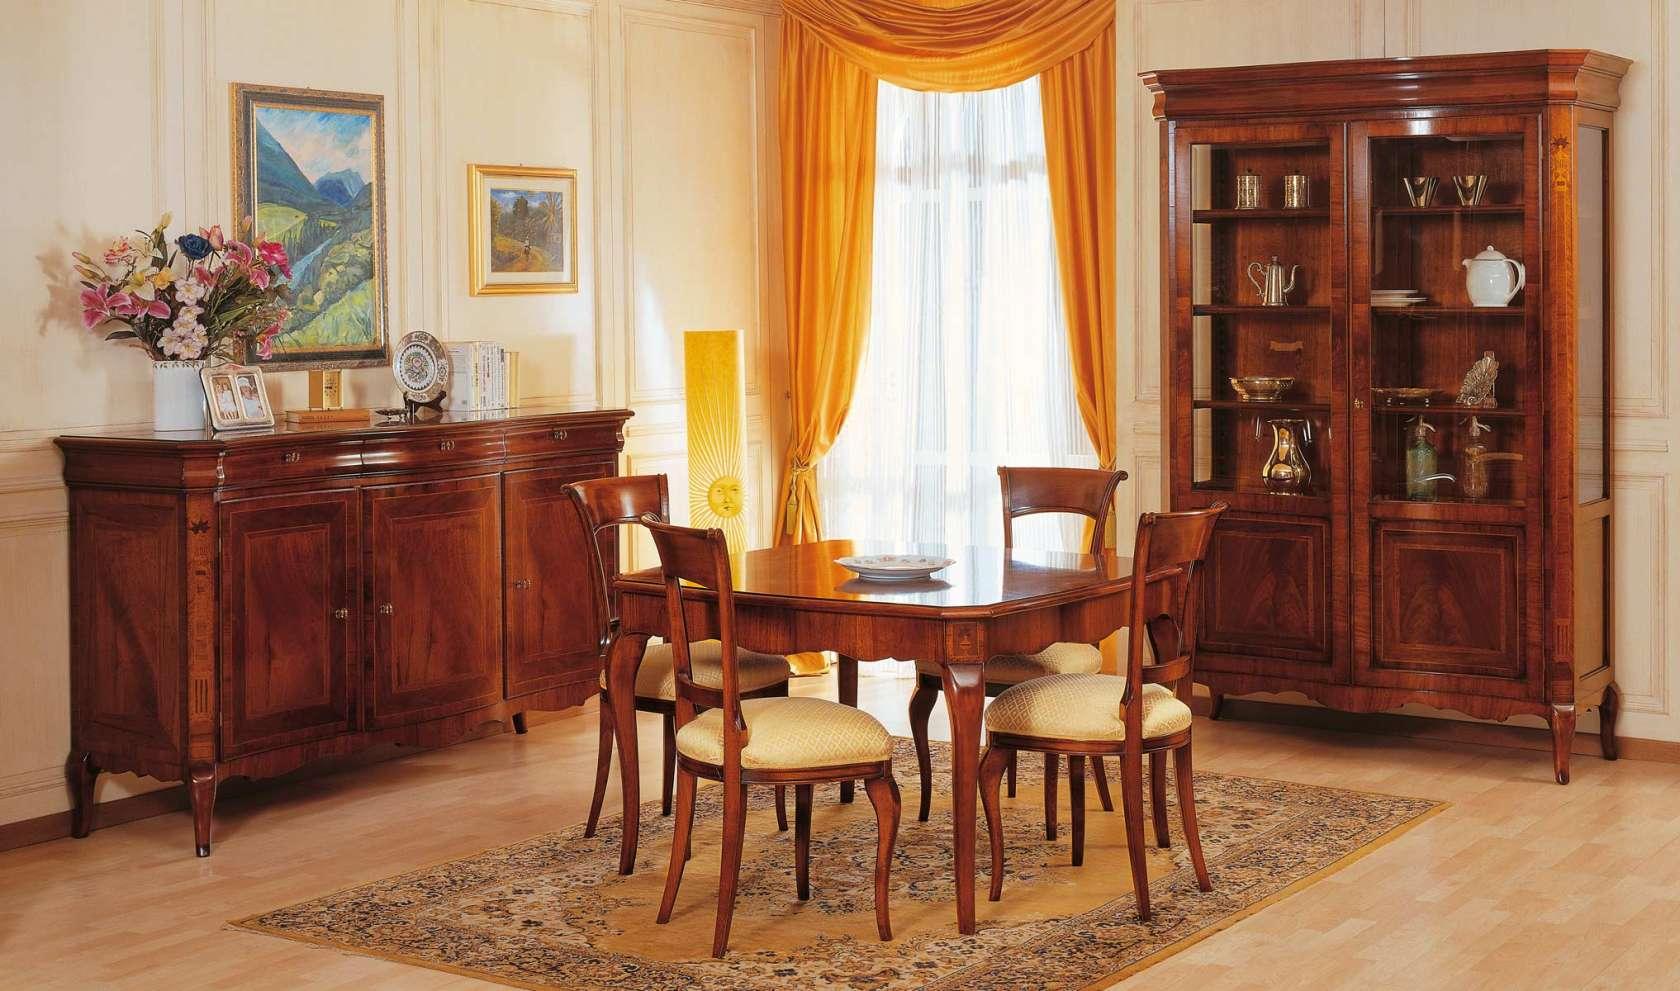 Sala da pranzo classica \'800 Francese | Vimercati Meda